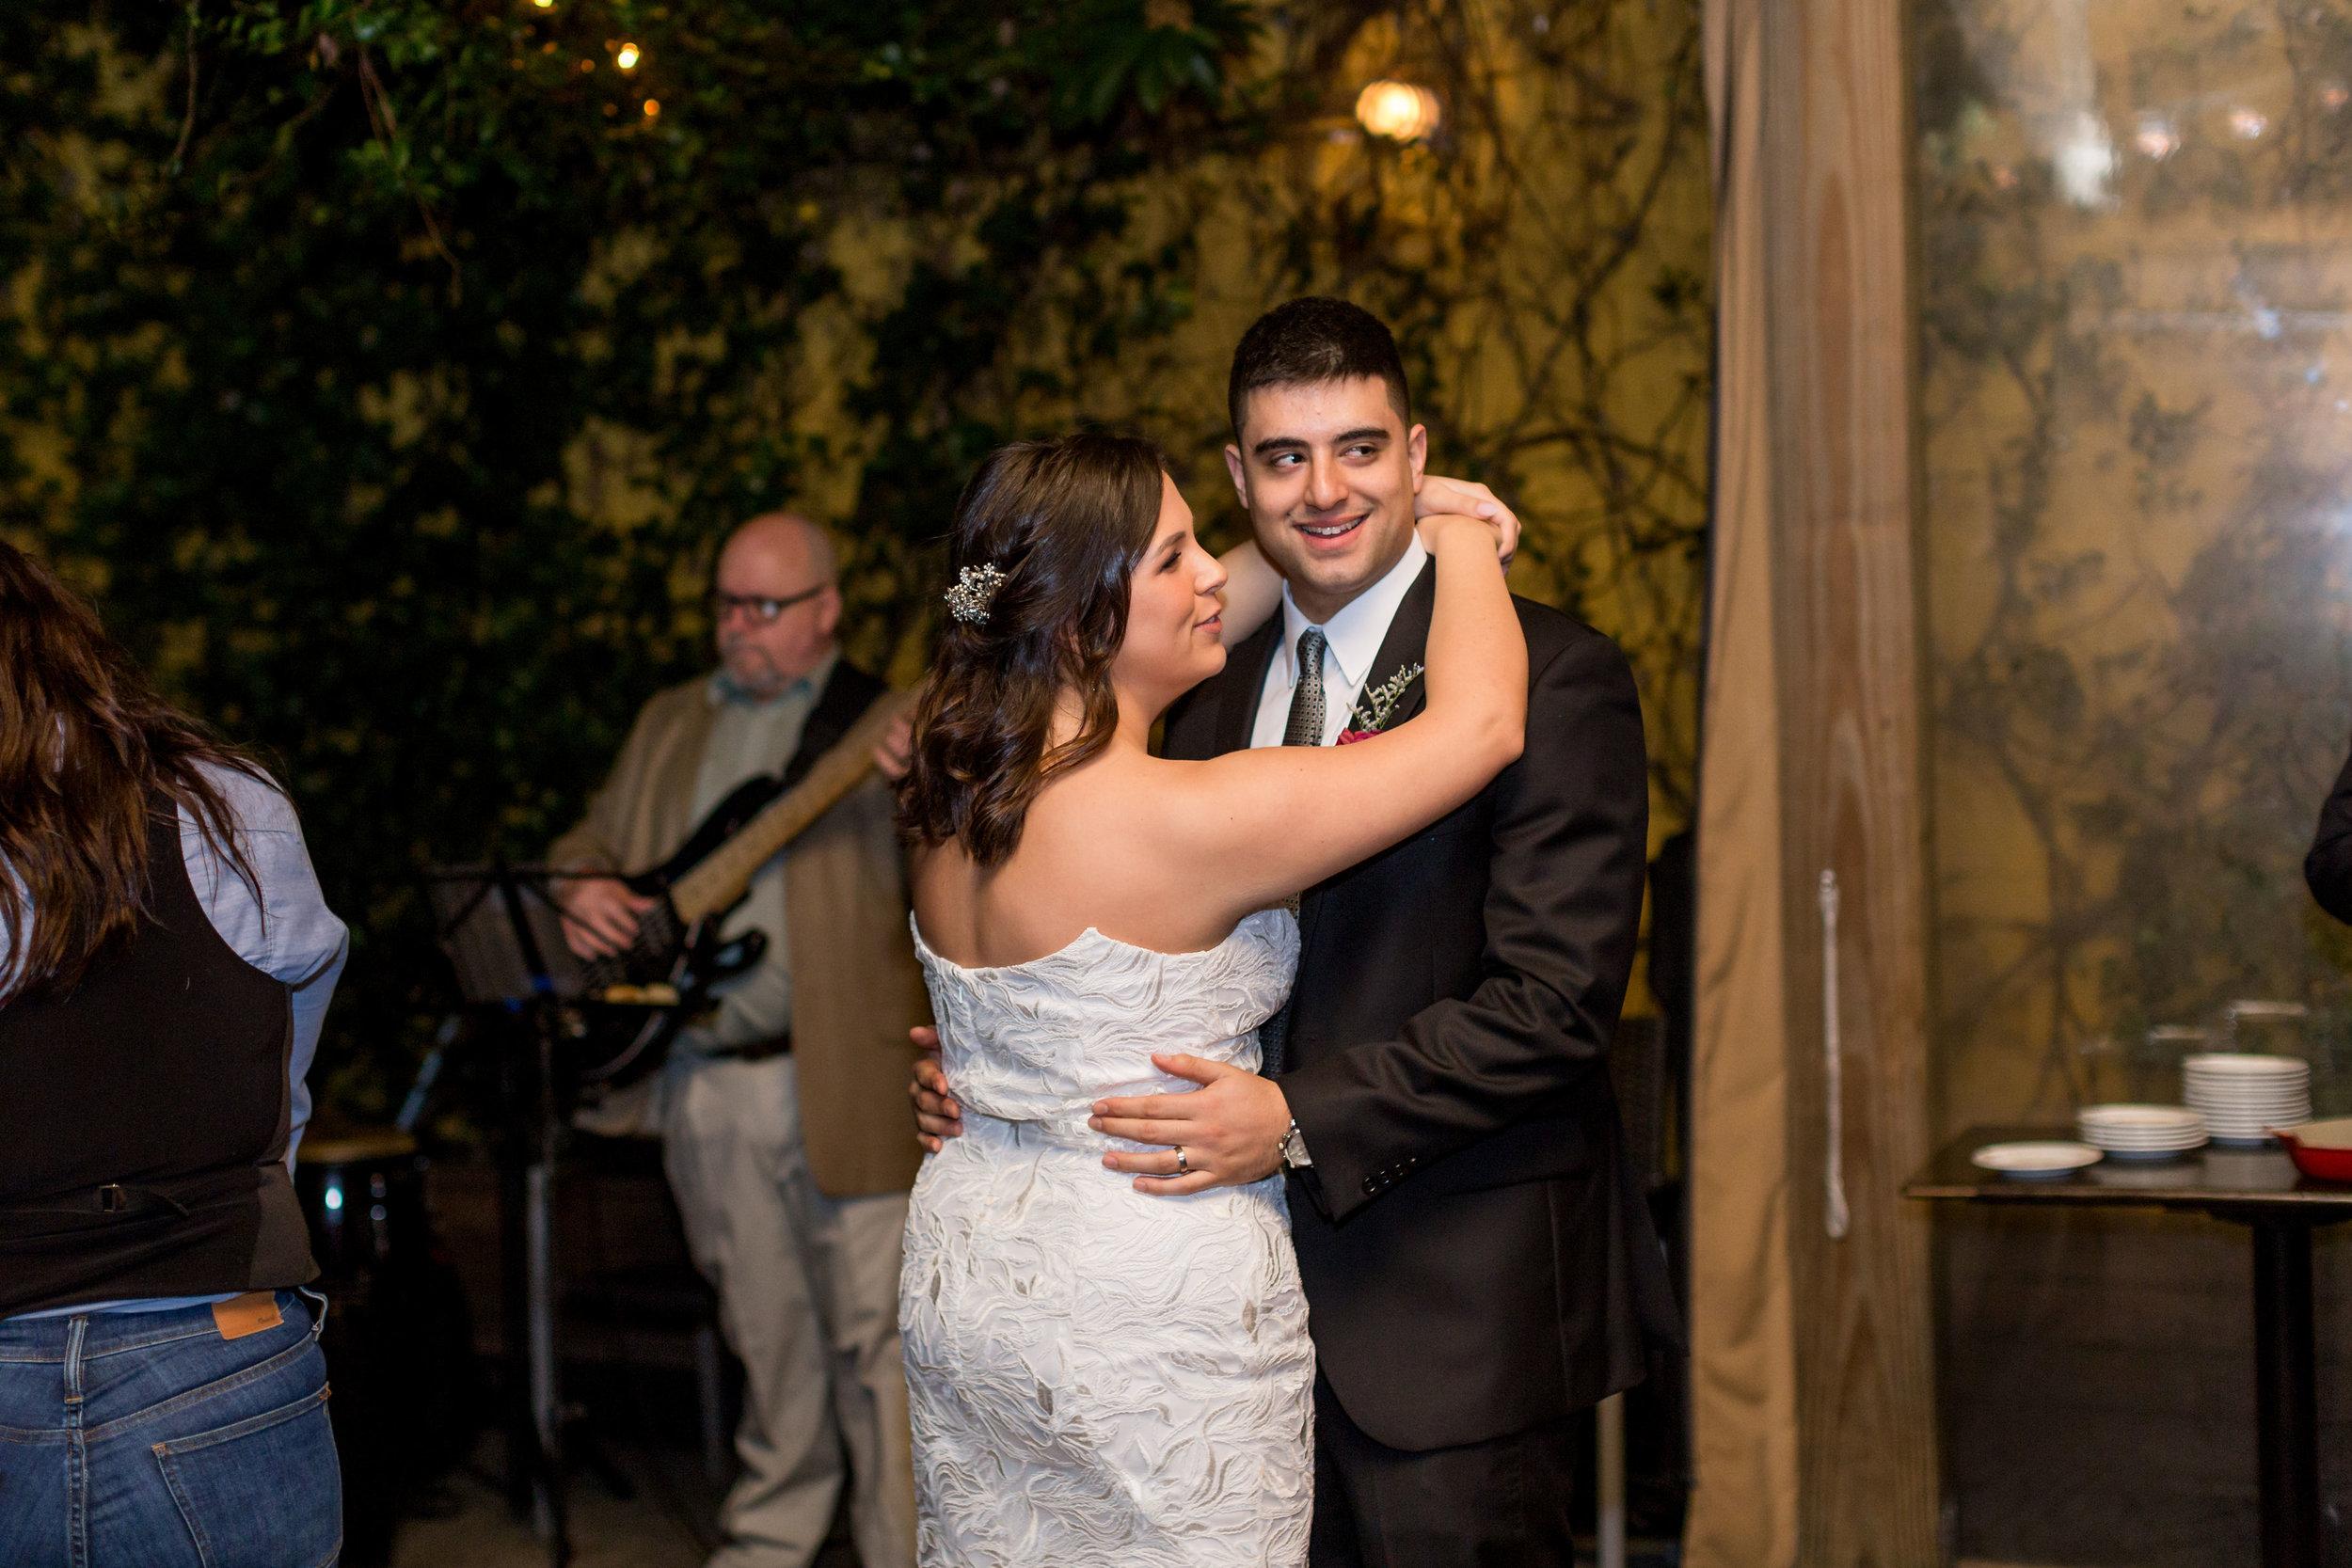 charleston new years elopement popup surprise wedding at upstairs at midtown - scarlet plan & design wedding planners (356).jpg